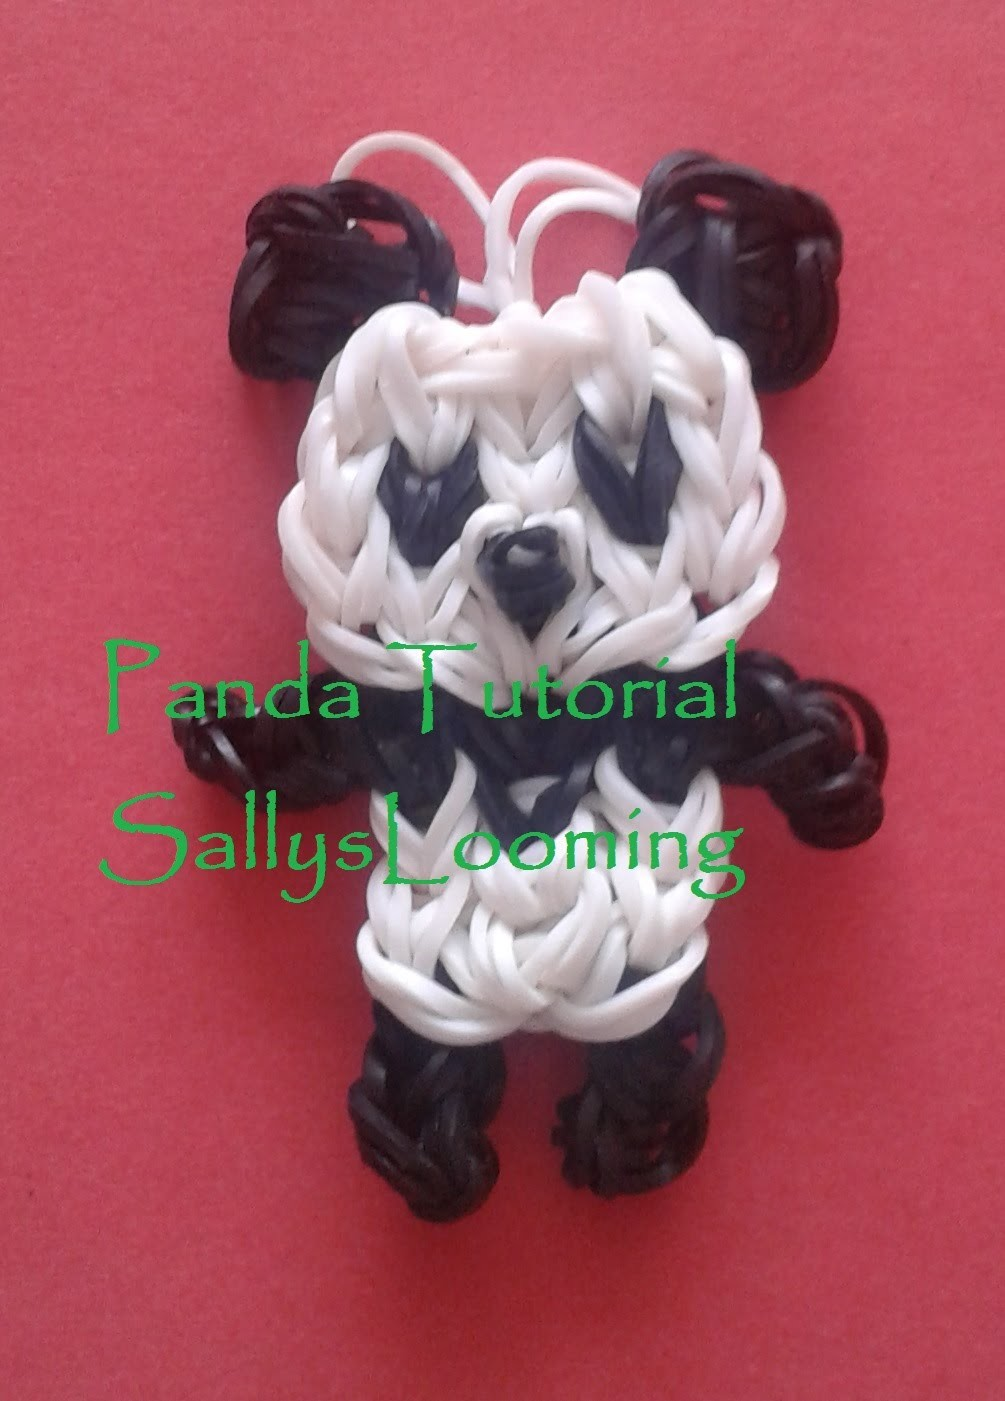 Cute Panda Charm Loom Band Tutorial